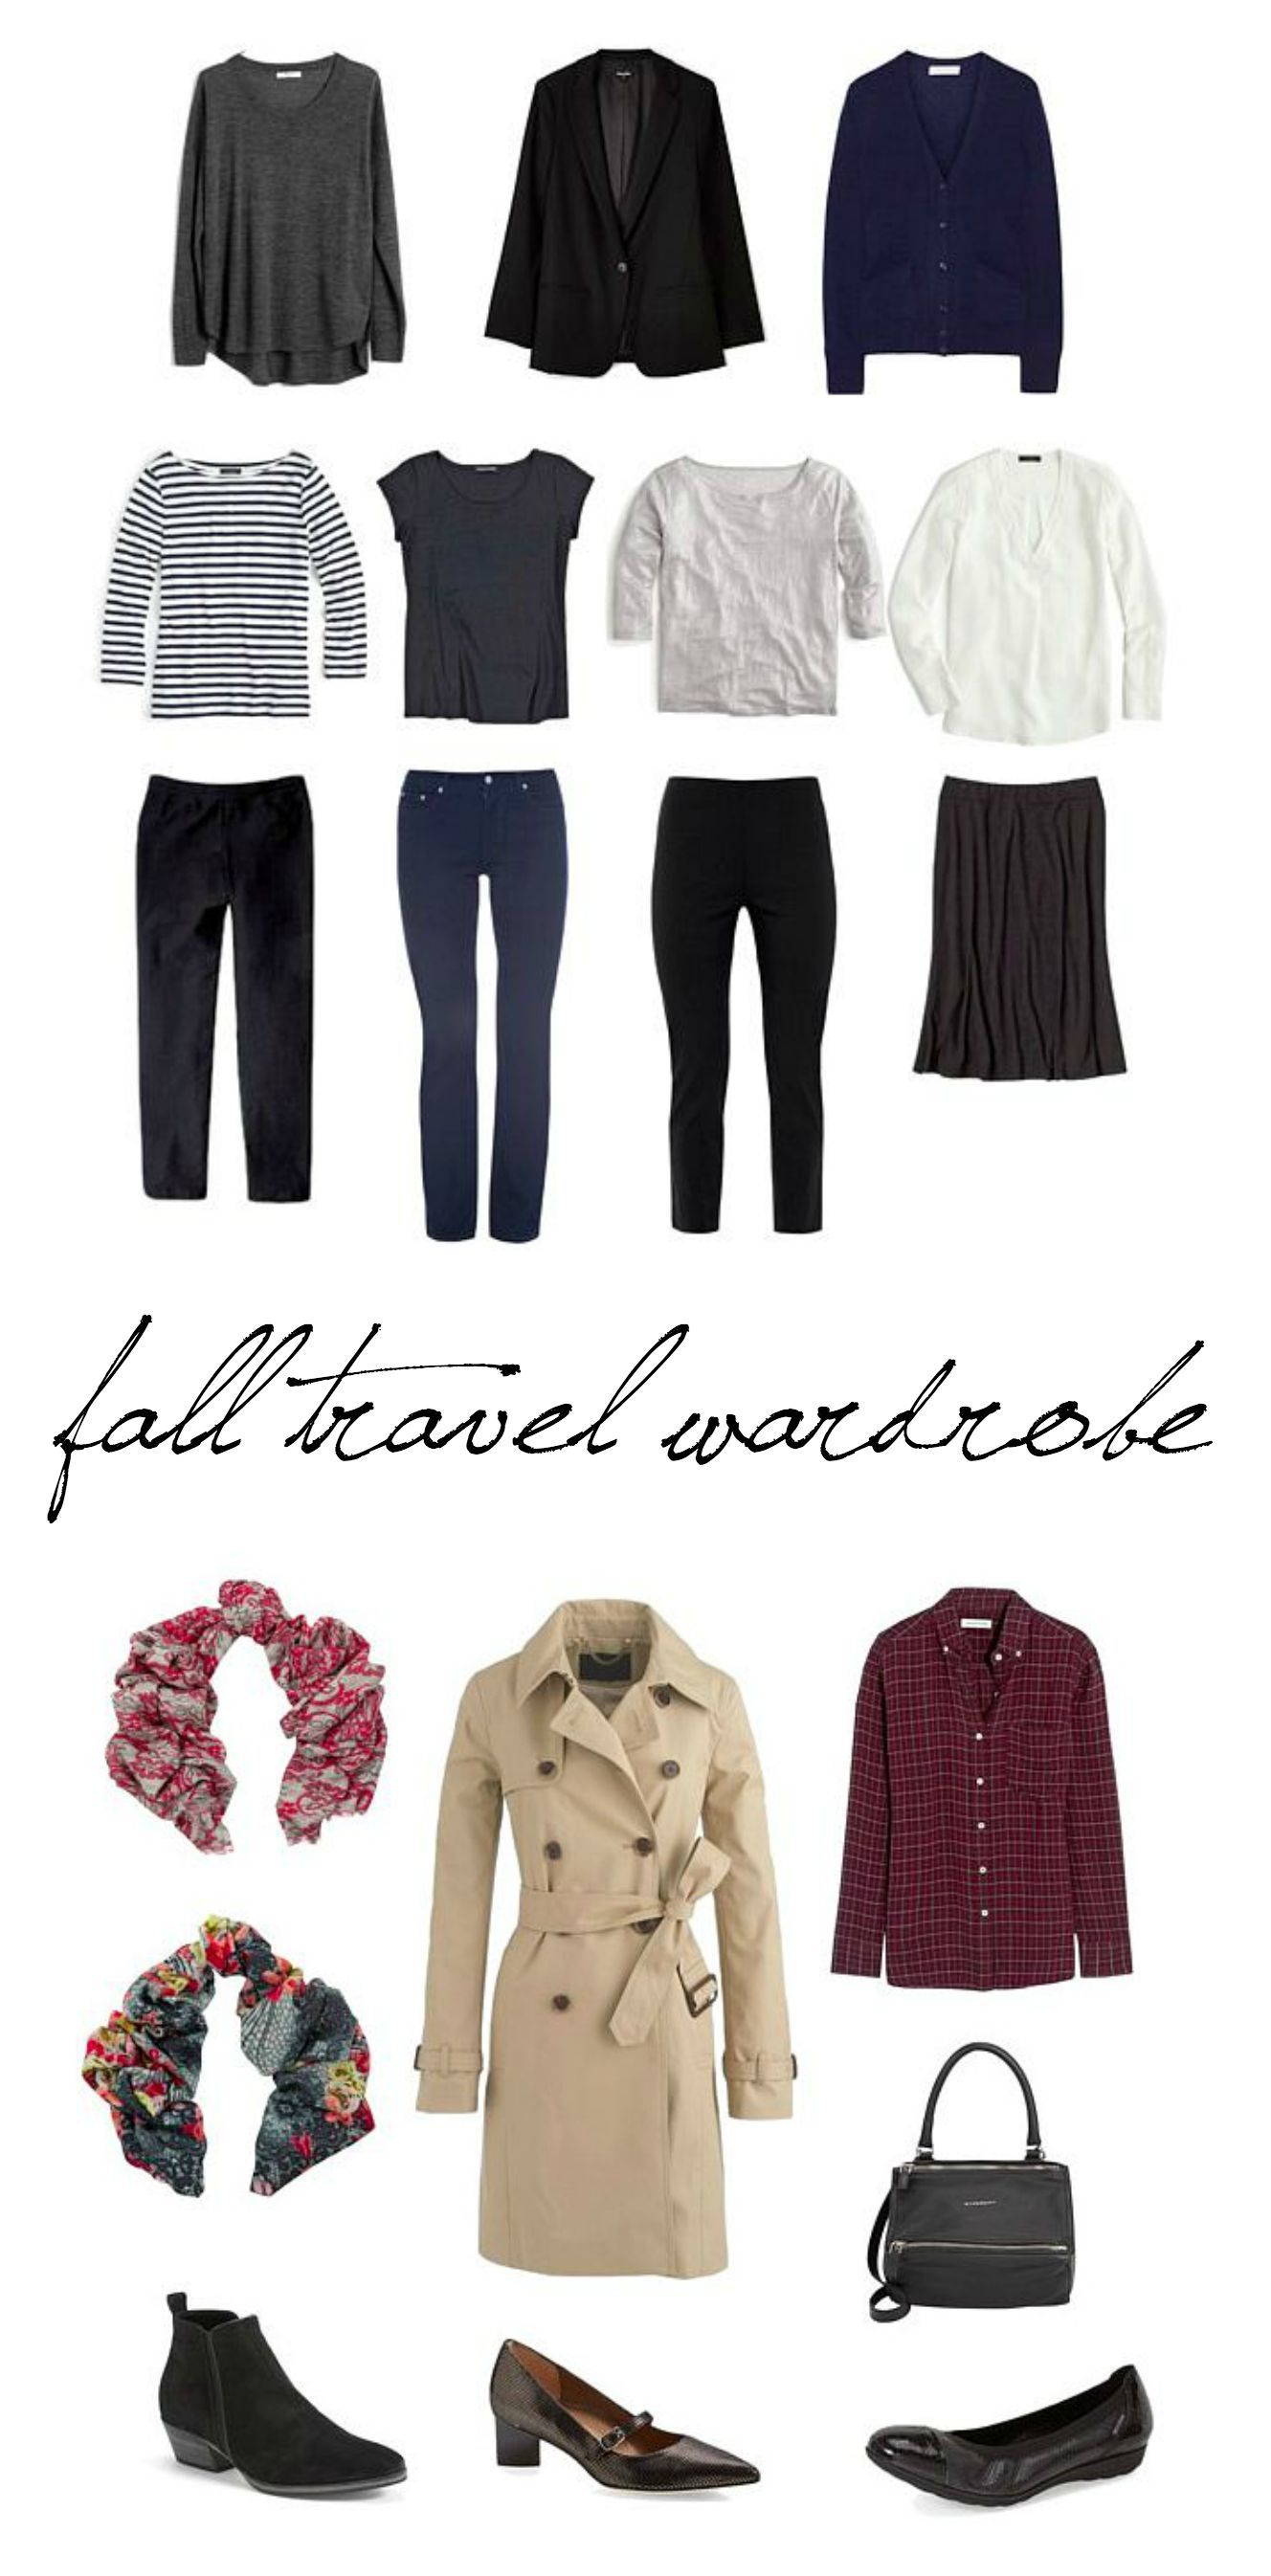 Paris Travel Wardrobe Fall 2015 London Calling